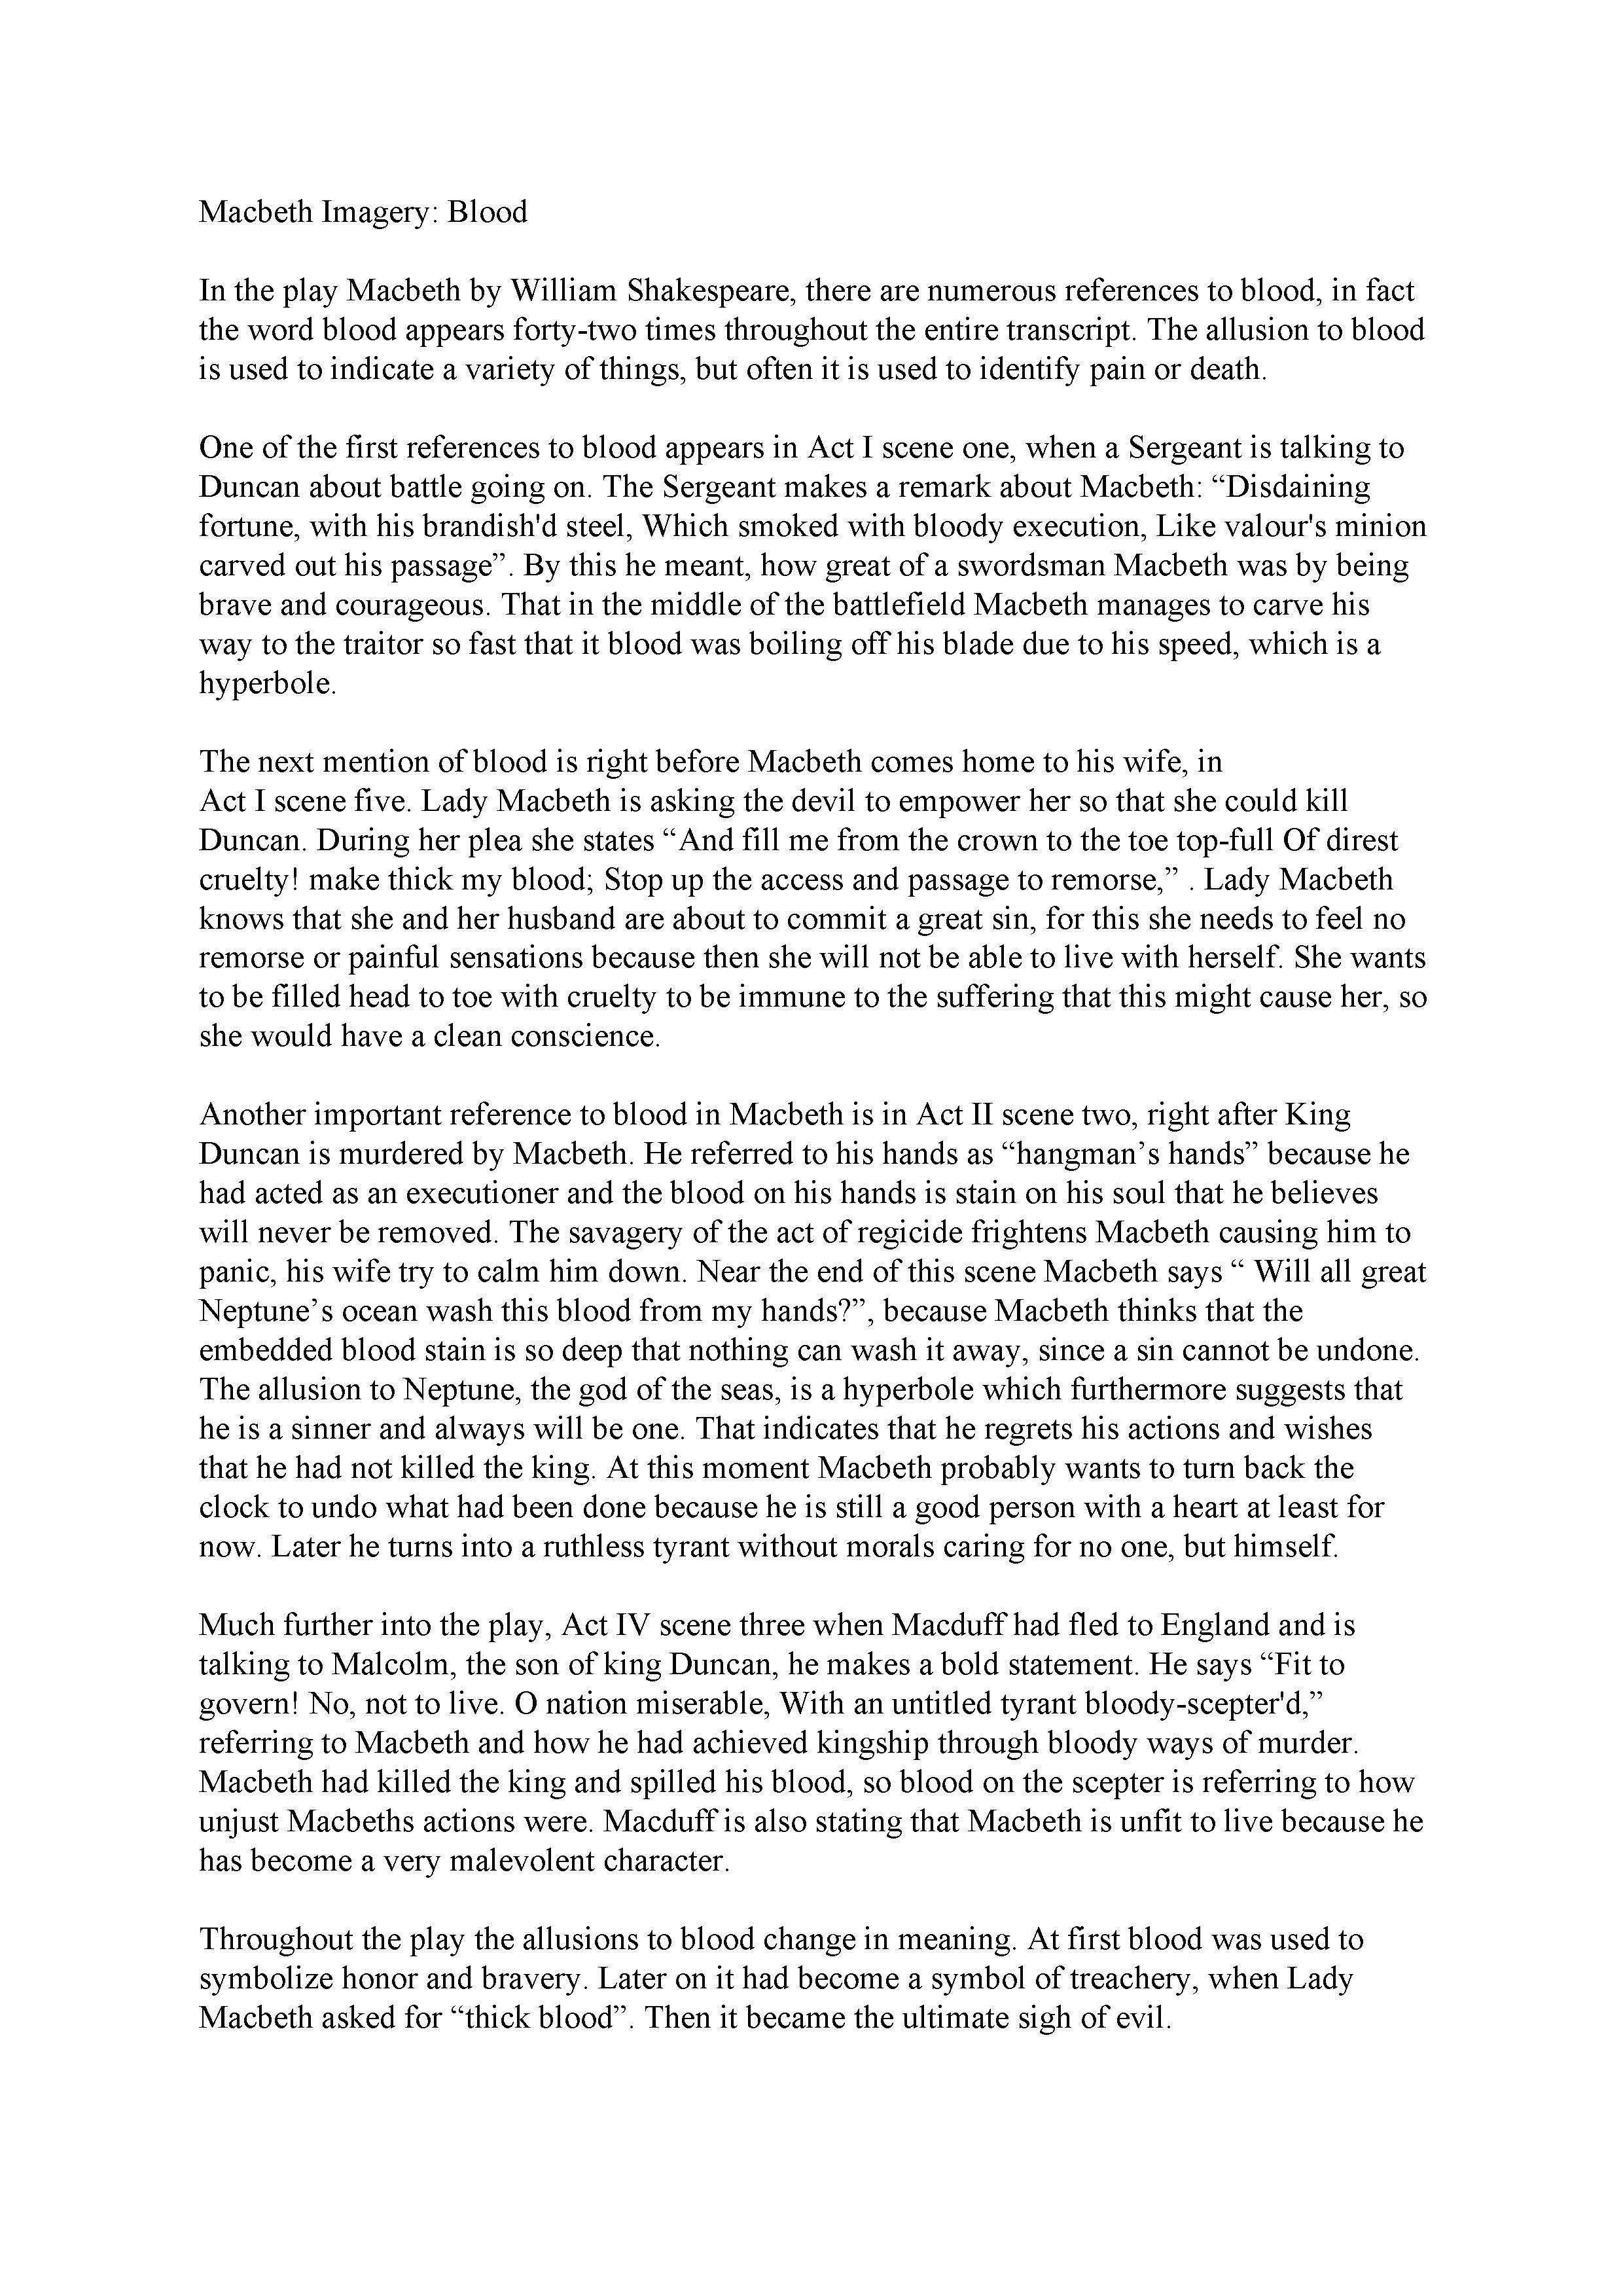 assignment on william shakespeare